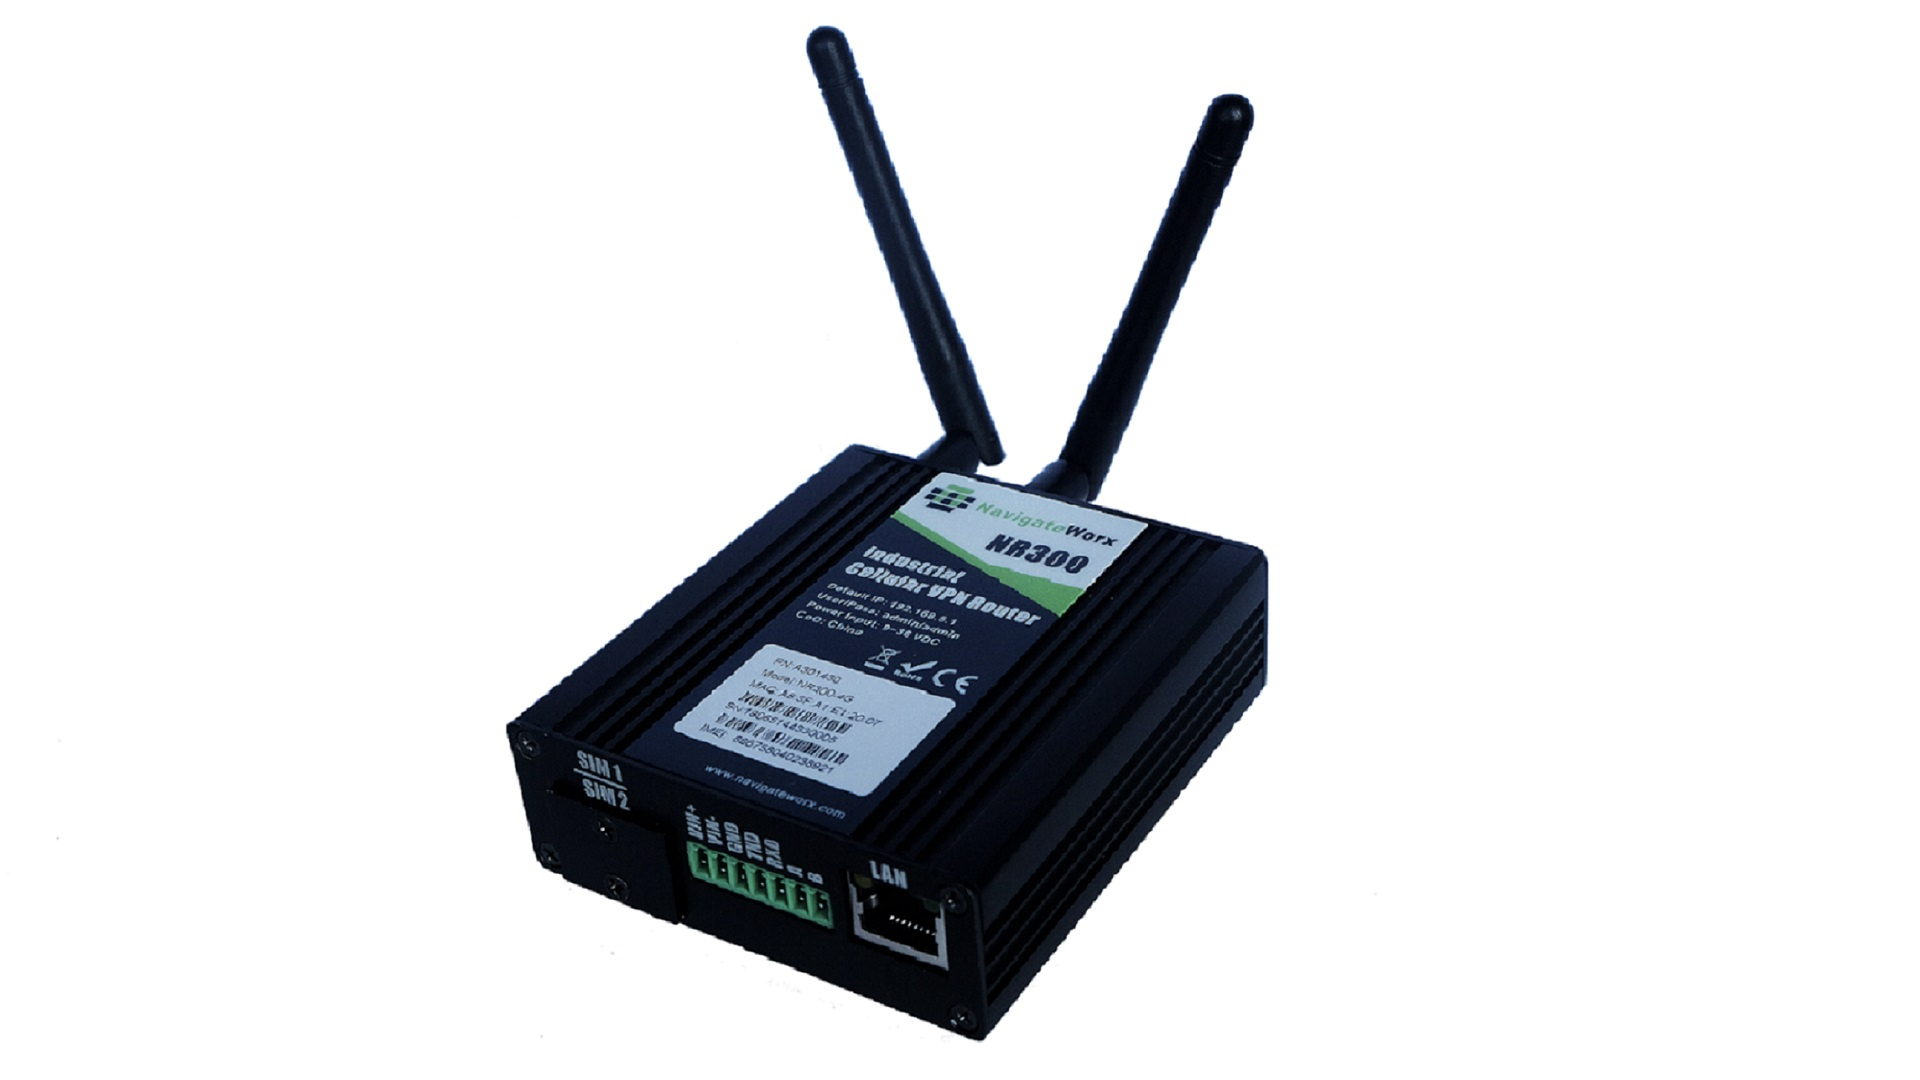 NR300 industriële 4G router